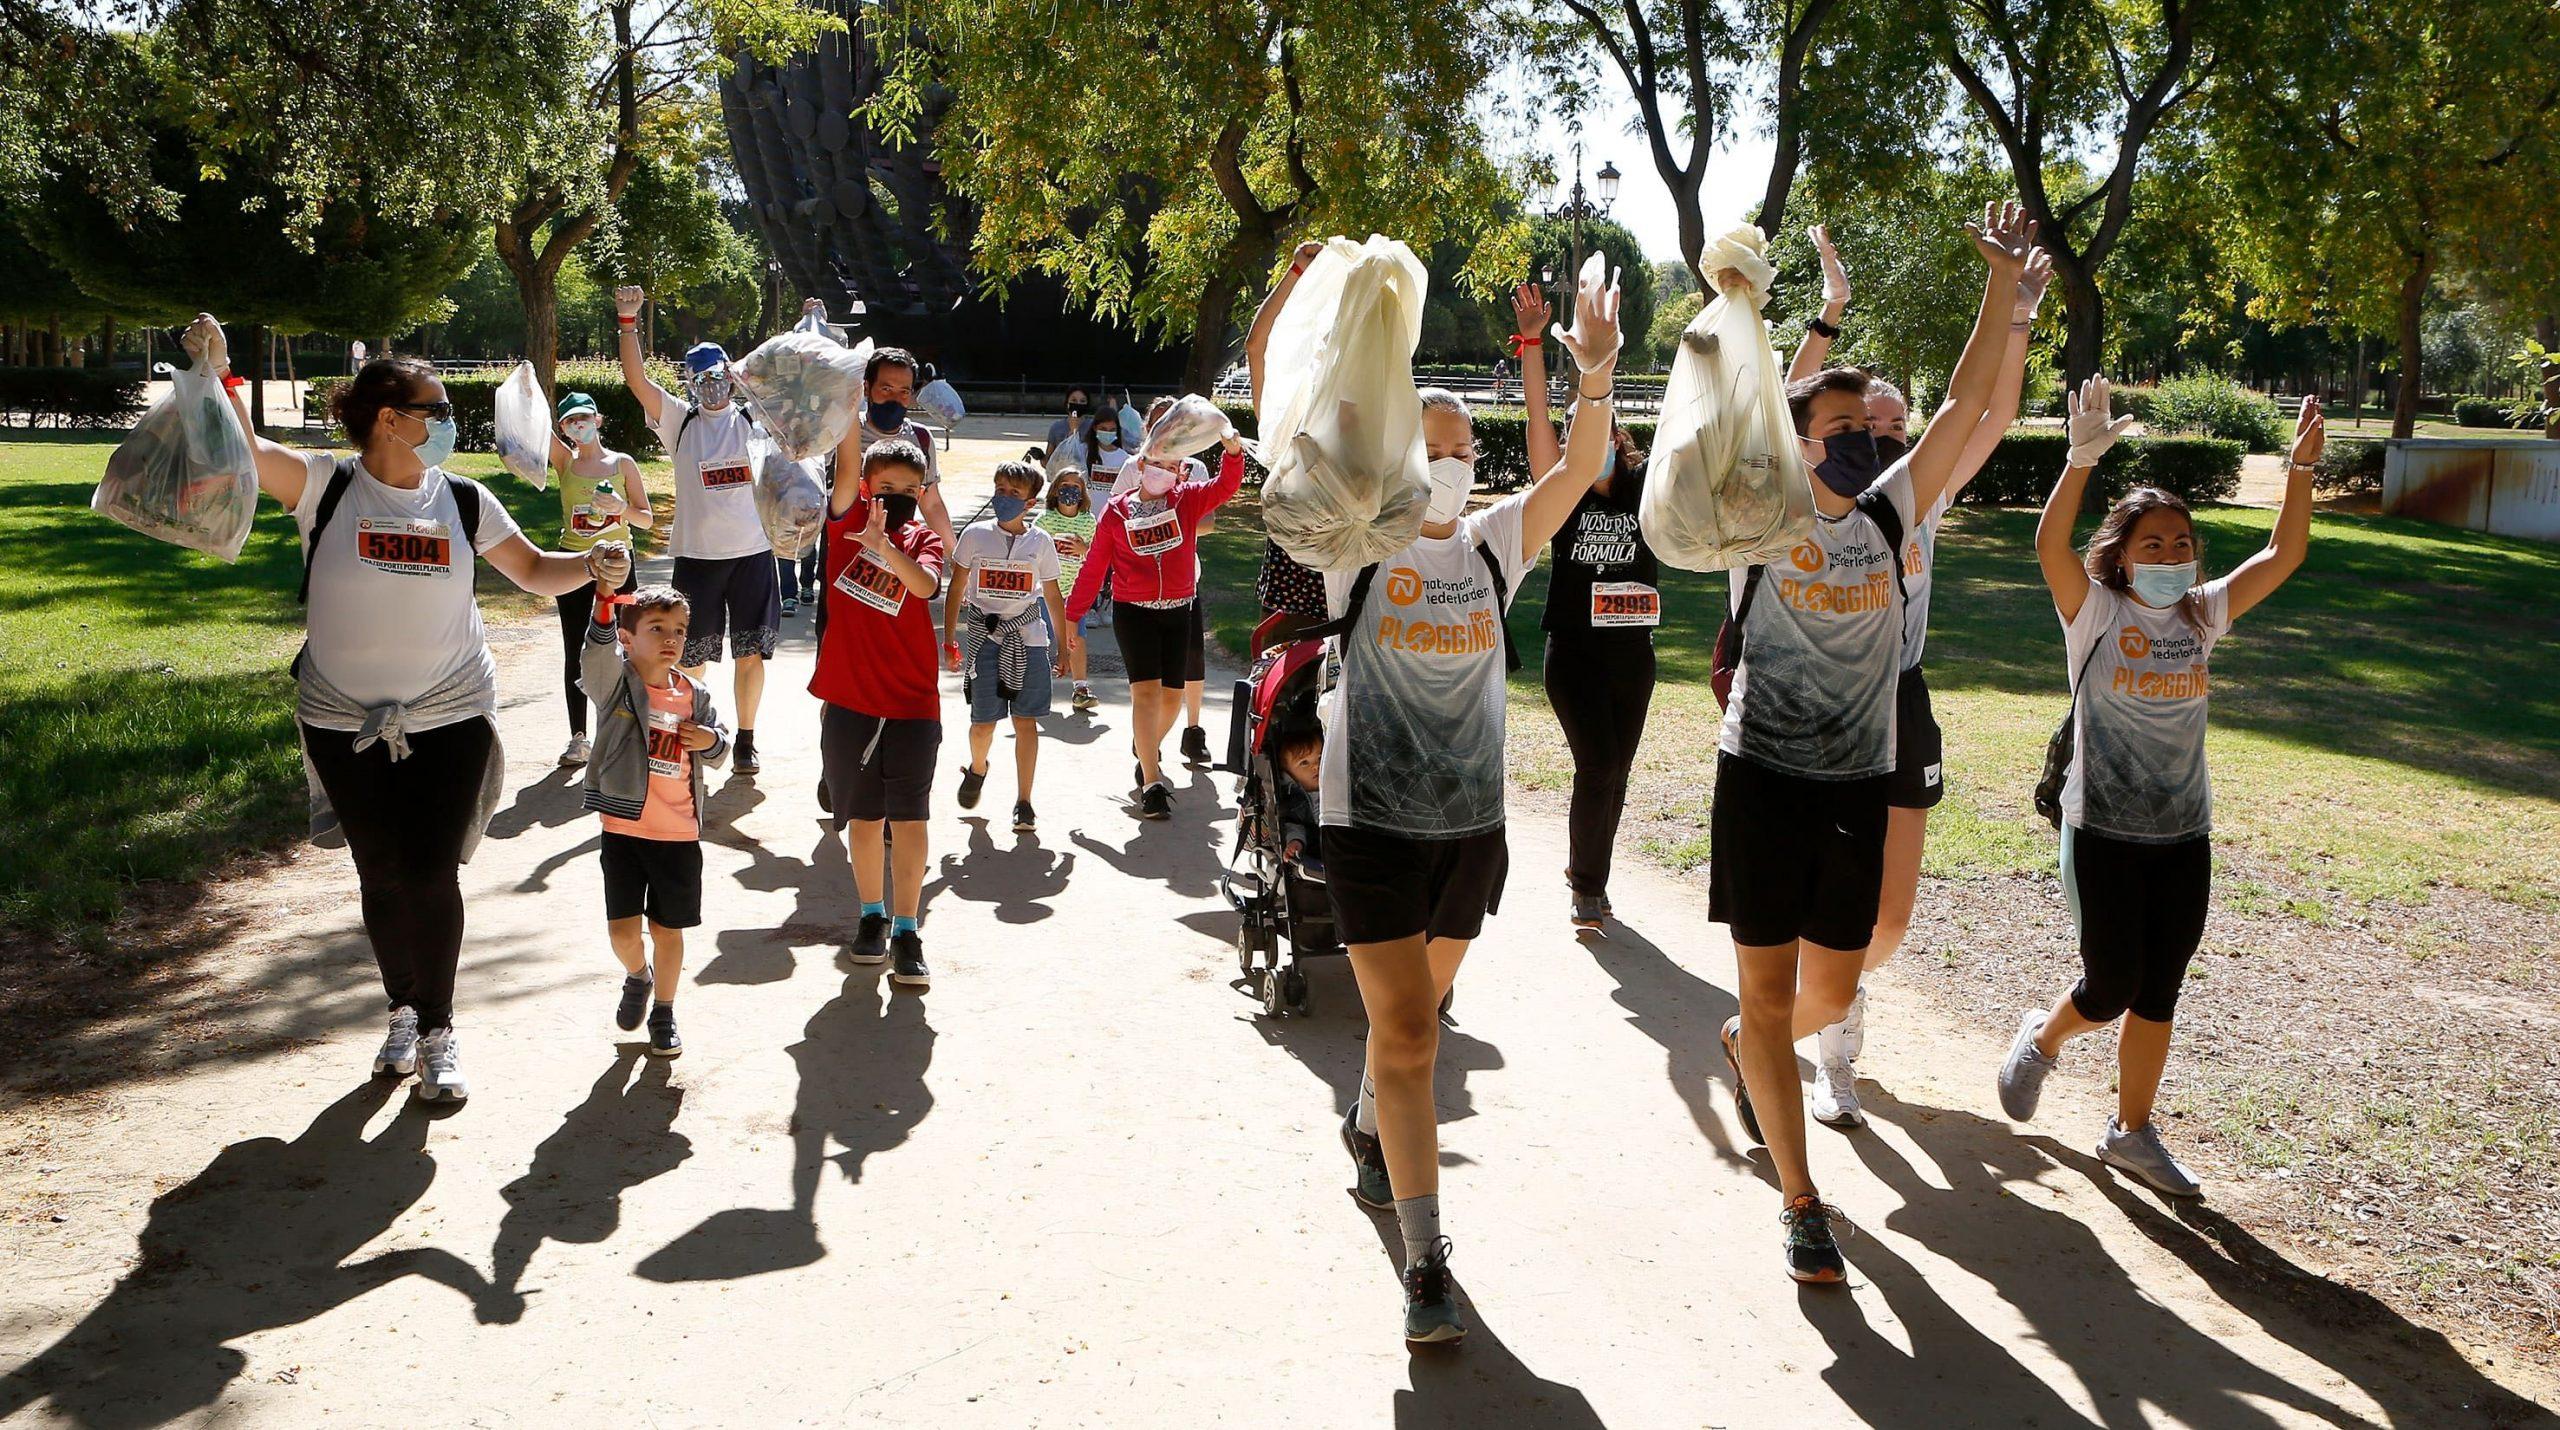 Euskadi acoge la 1ª gira de deporte y ecología que se celebra en Europa, Nationale-Nederlanden Plogging Tour